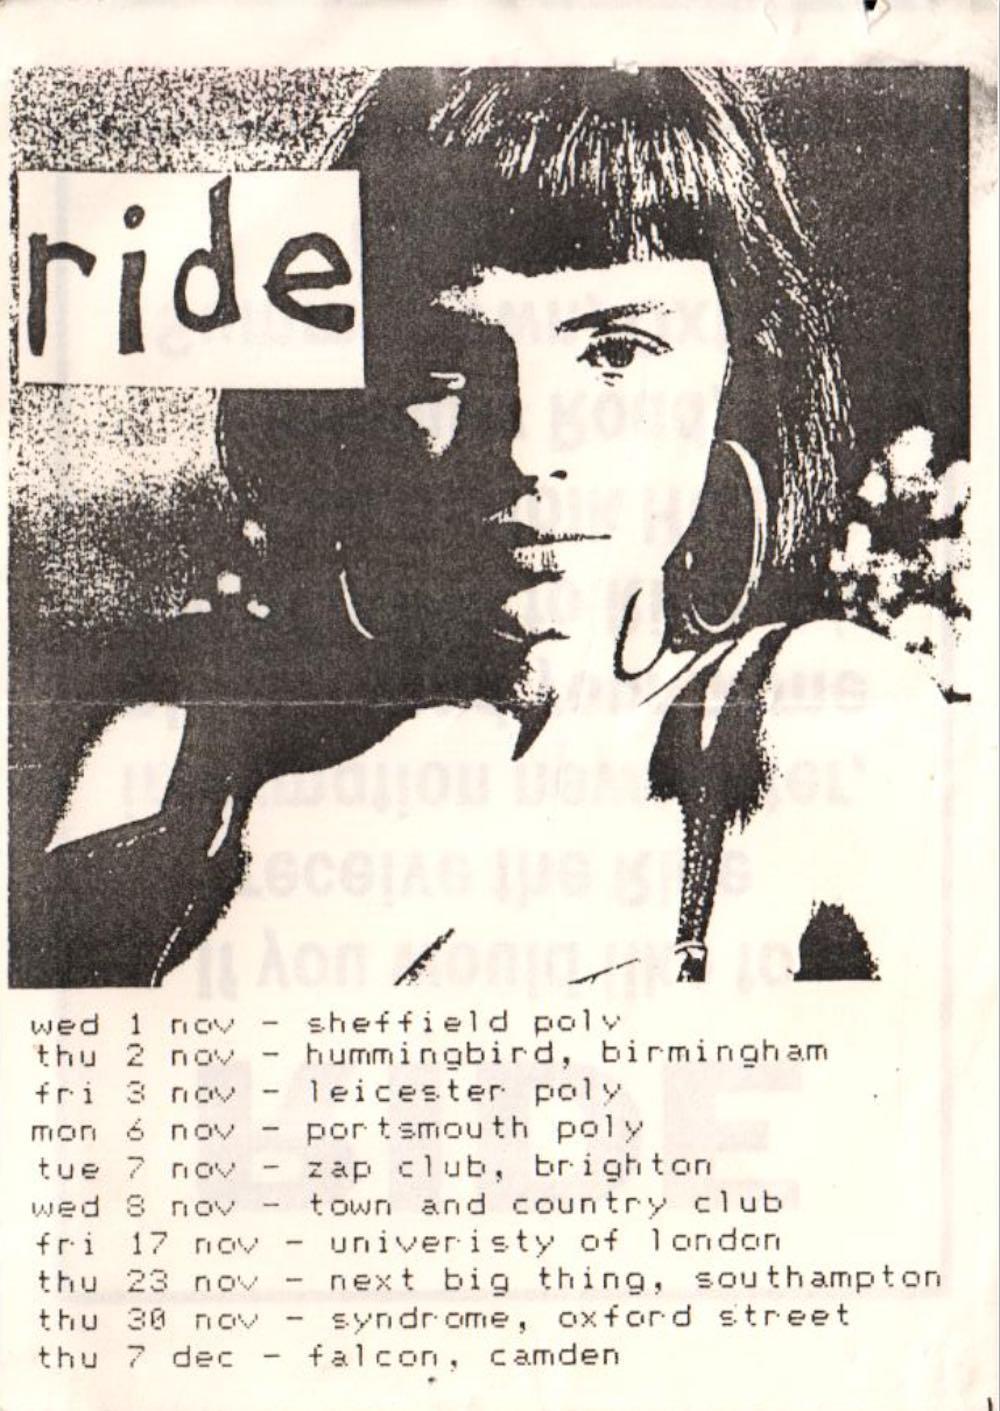 1989 tour poster